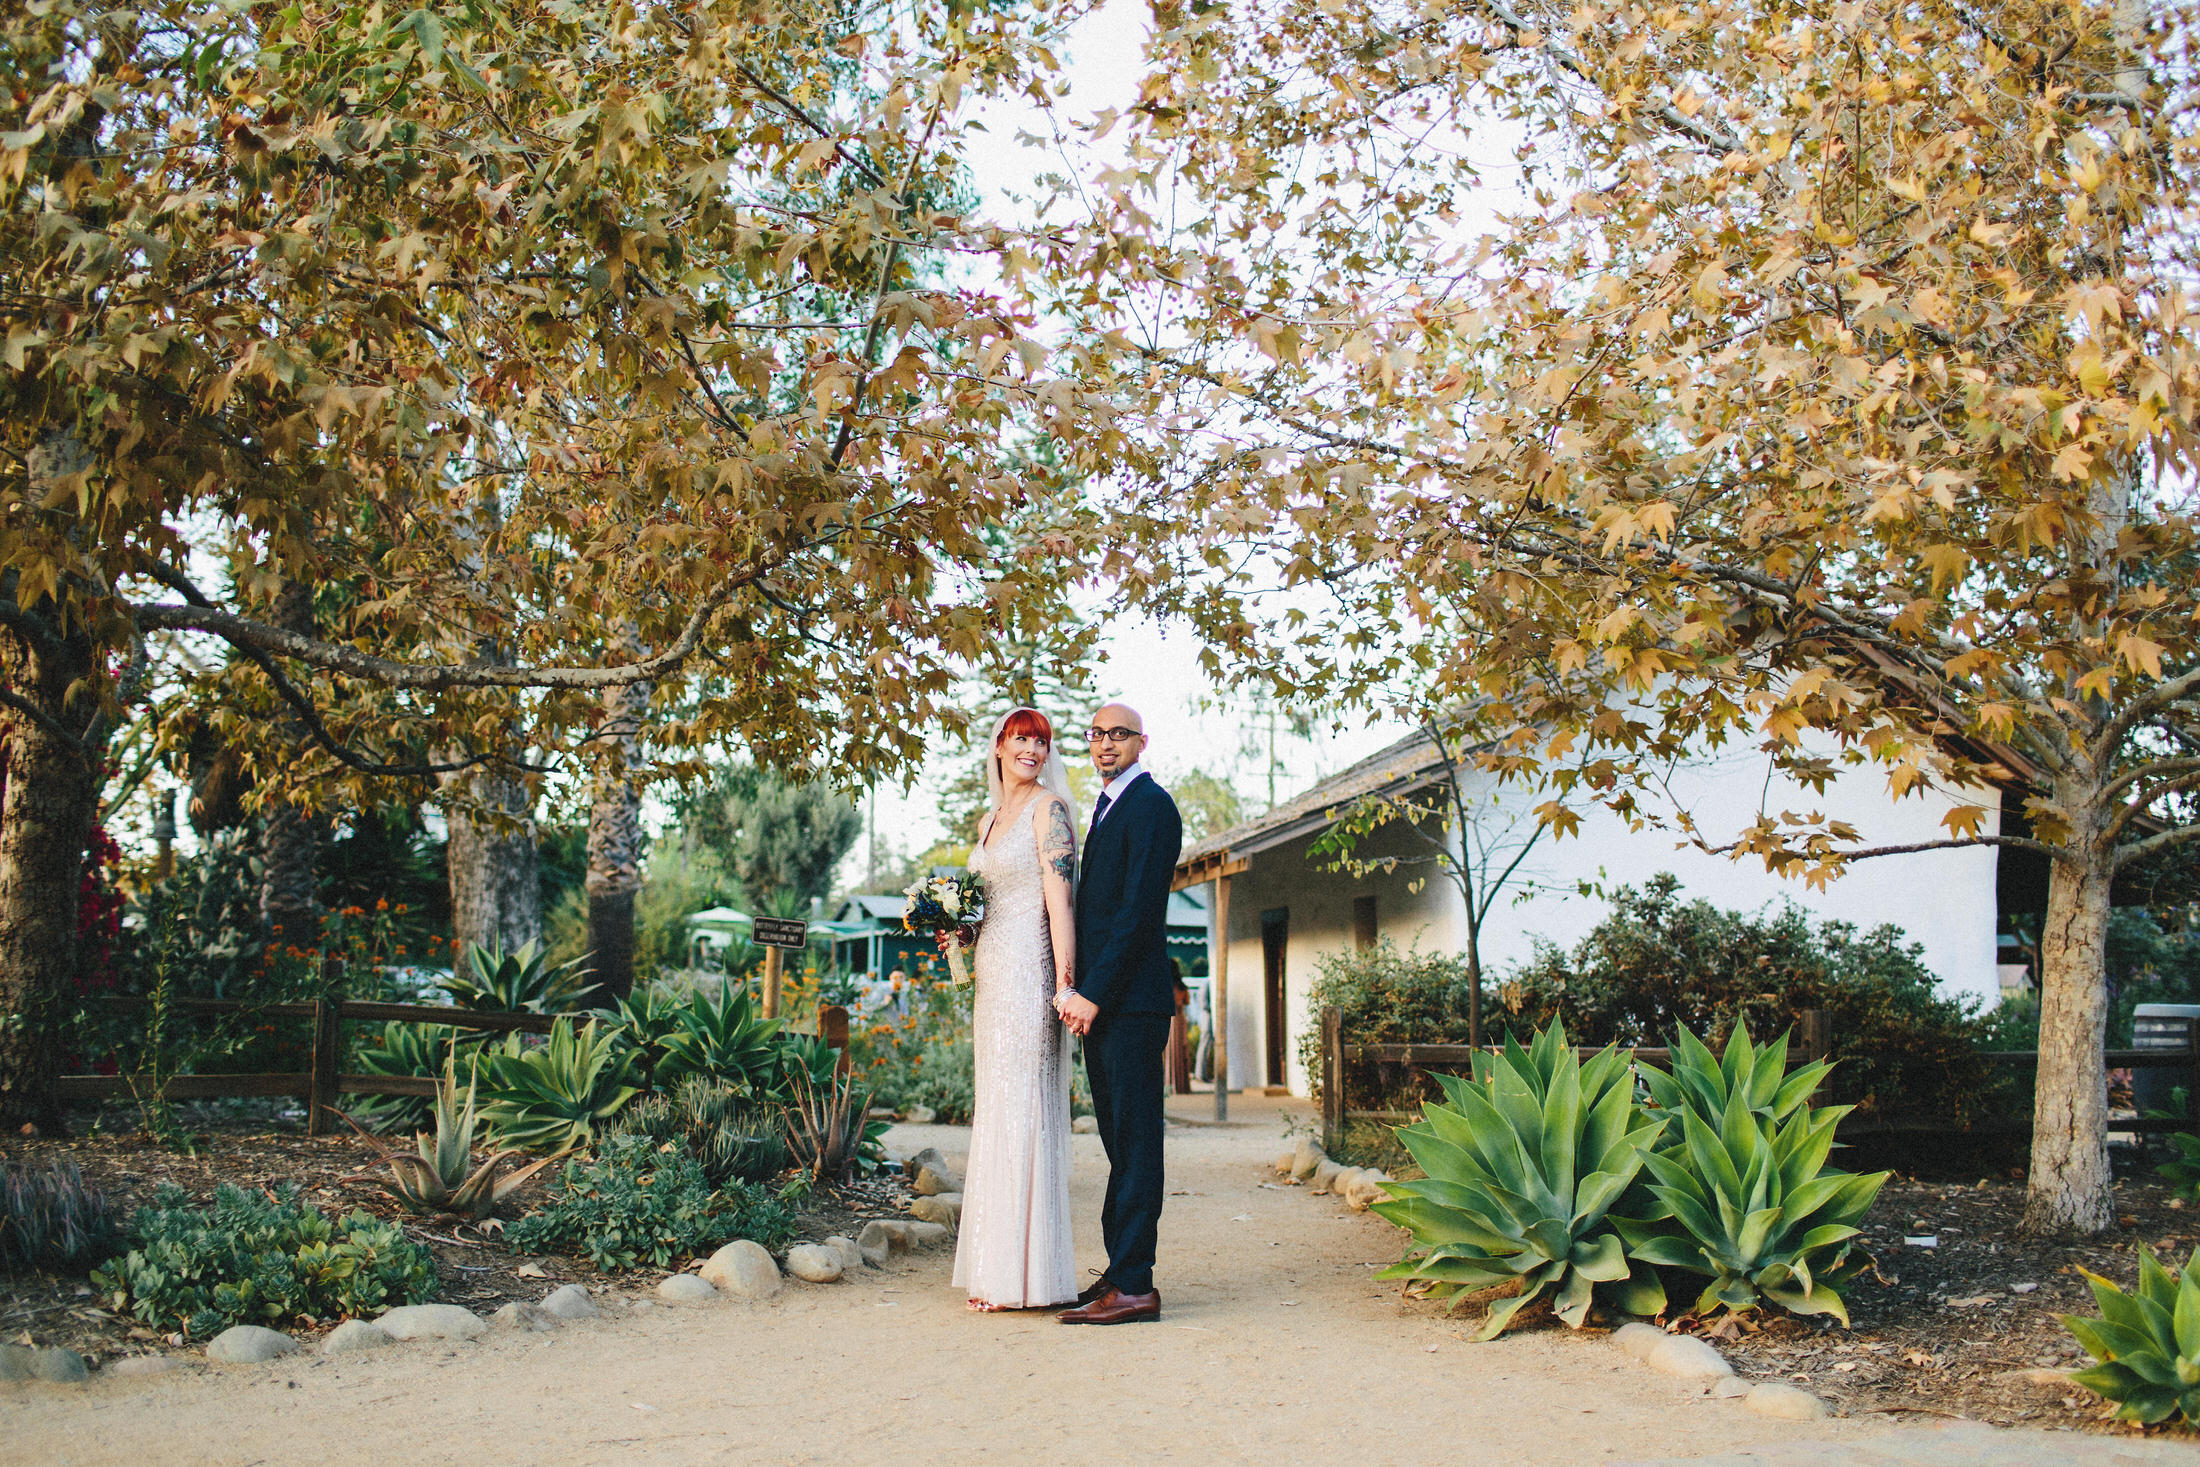 Modern-Indian-Serra-Plaza-wedding-079.jpg